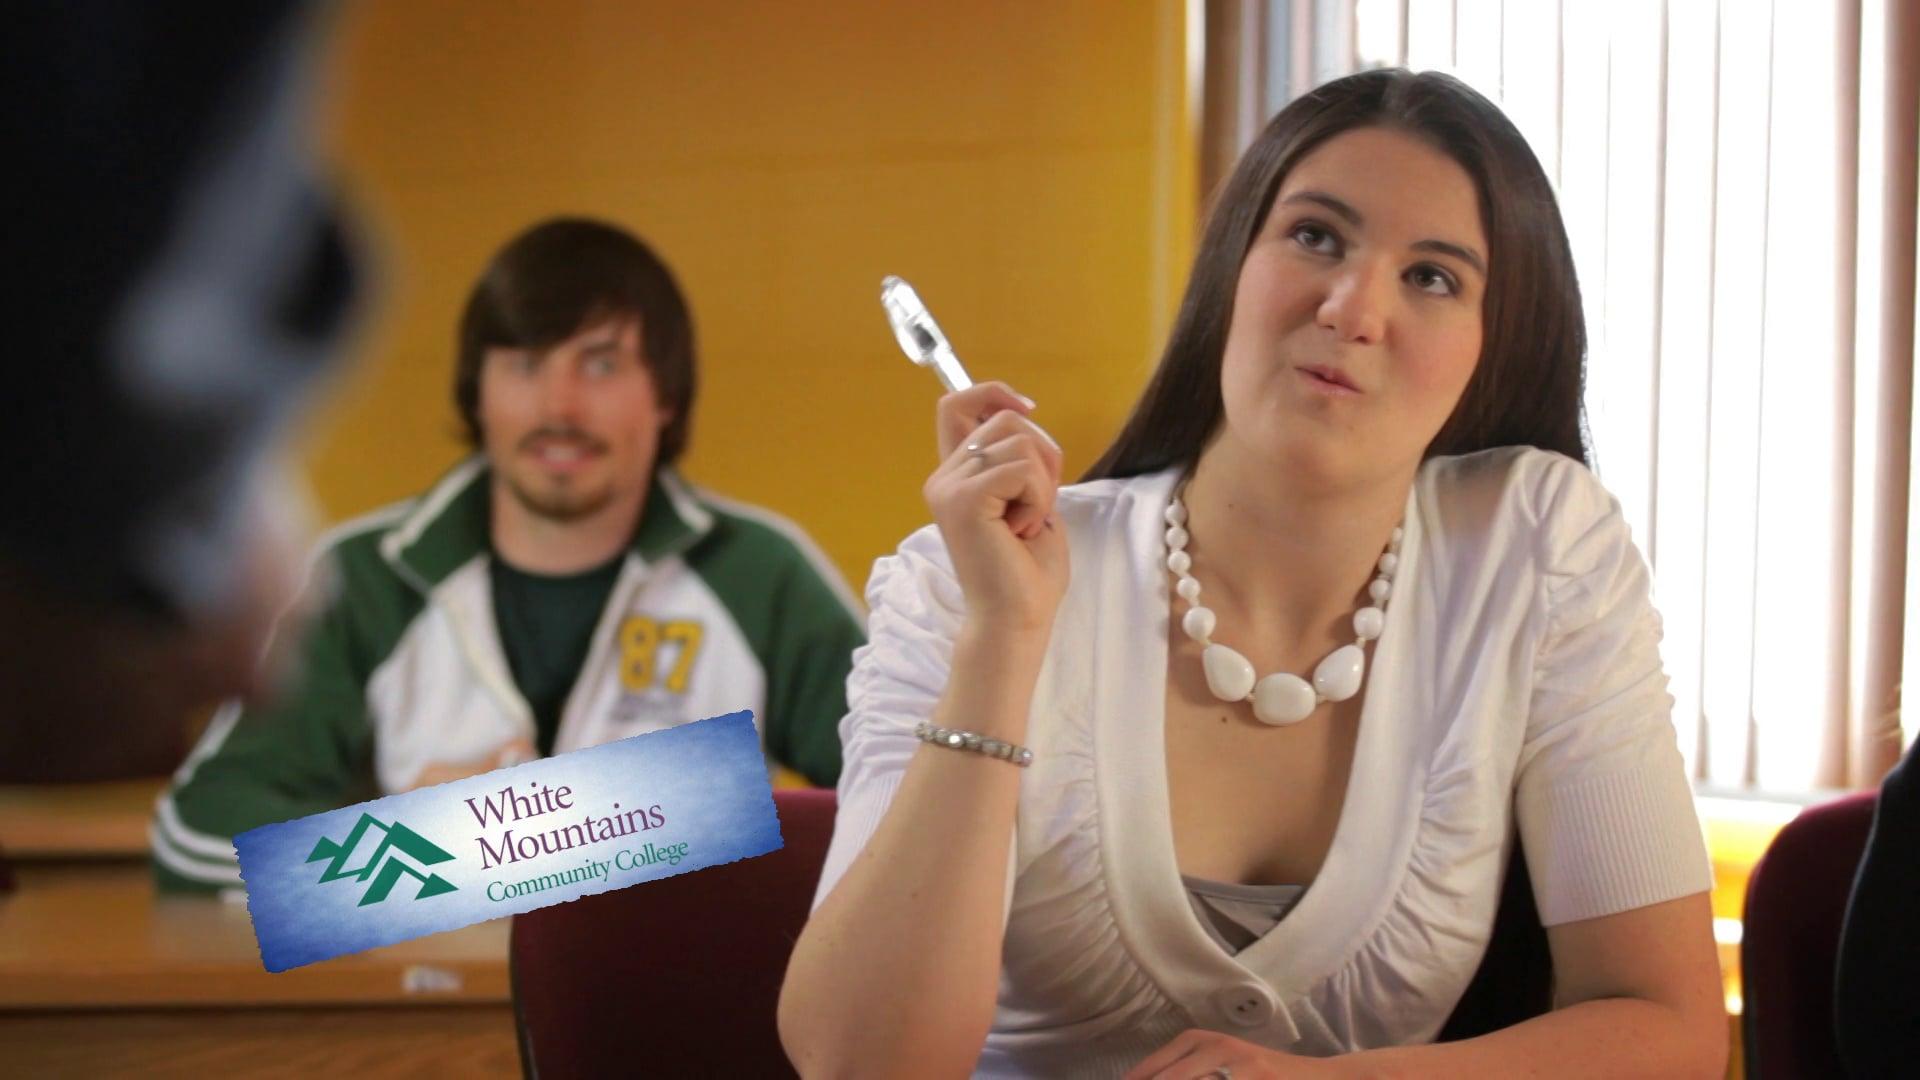 WMCC-White Mountains Community College- Success